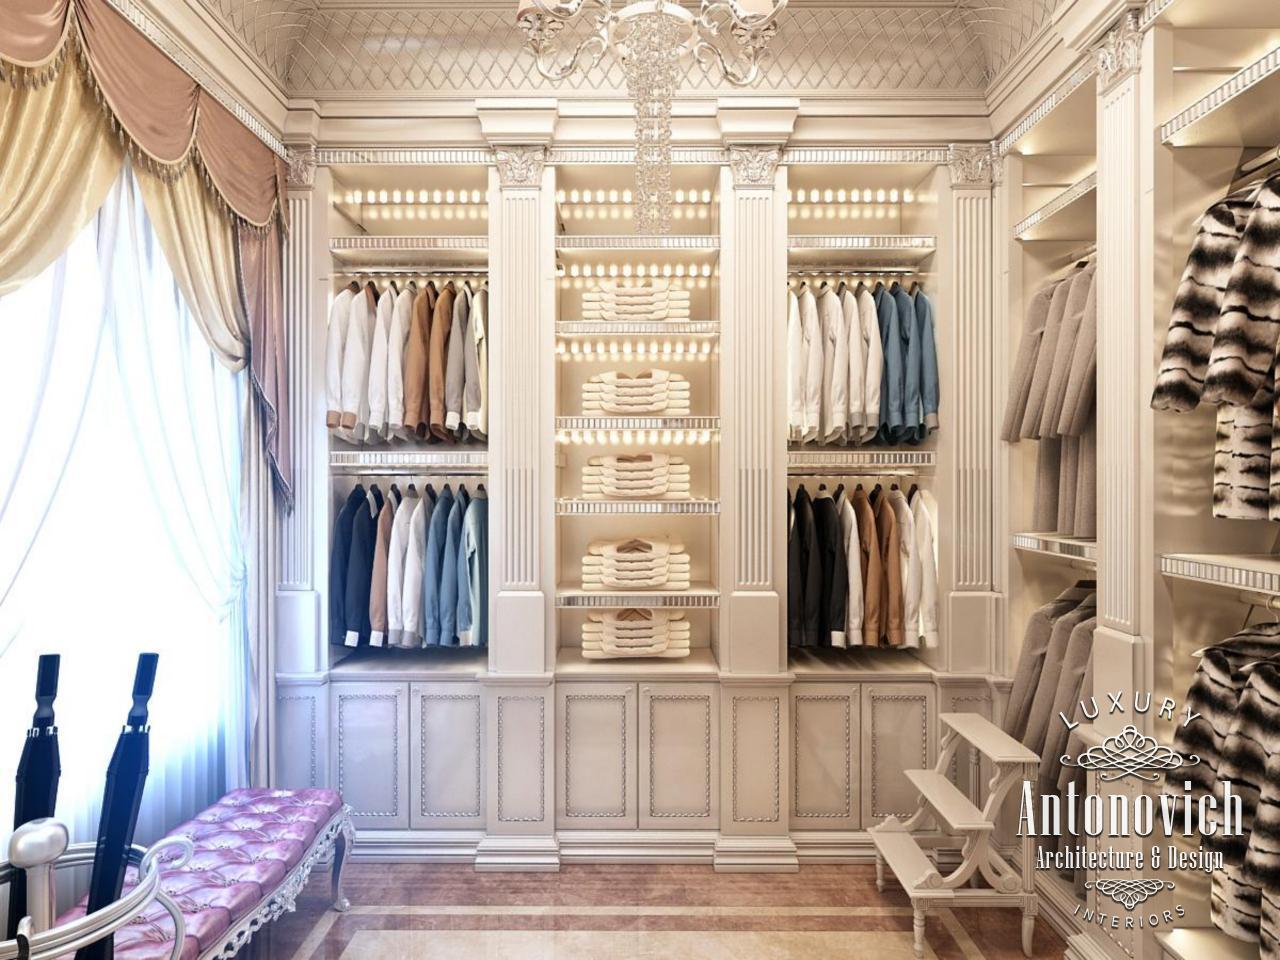 Interior Design: Interior Design Dressing Room. Dressing Room Ideas From Antonovich Wallpaper Interior Design For Androids Hd Luxury Uae